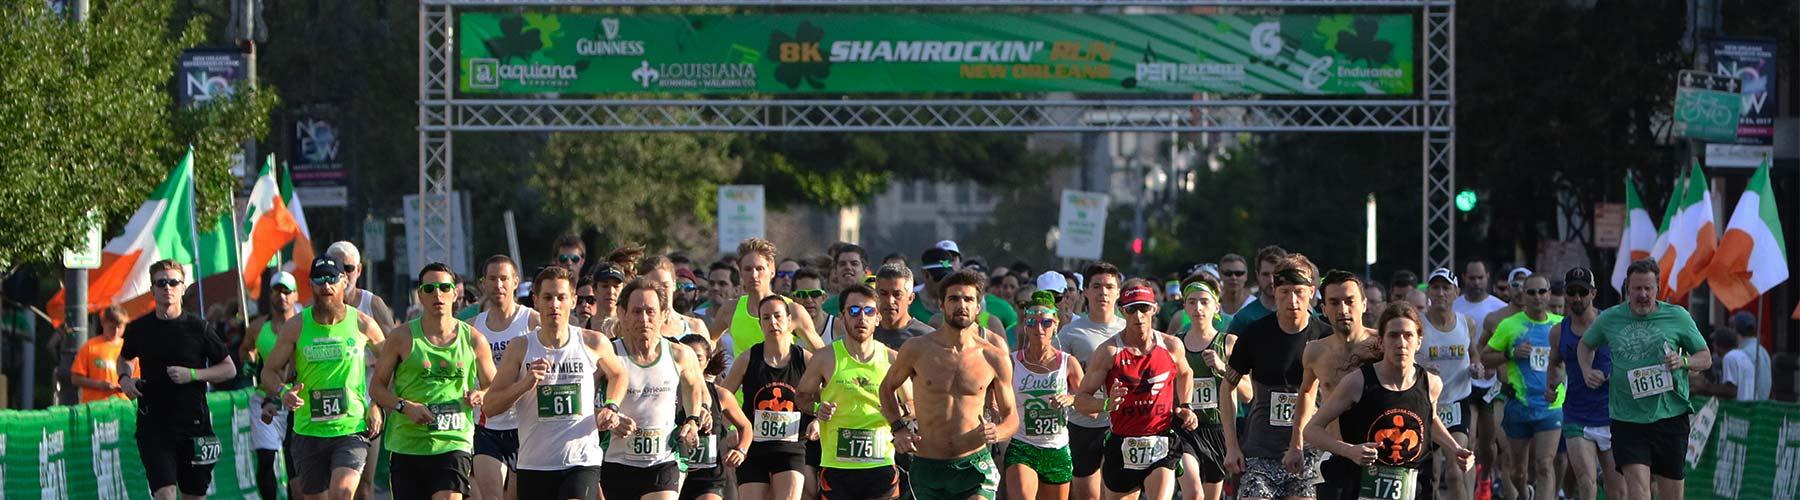 shamrockin run new orleans hero